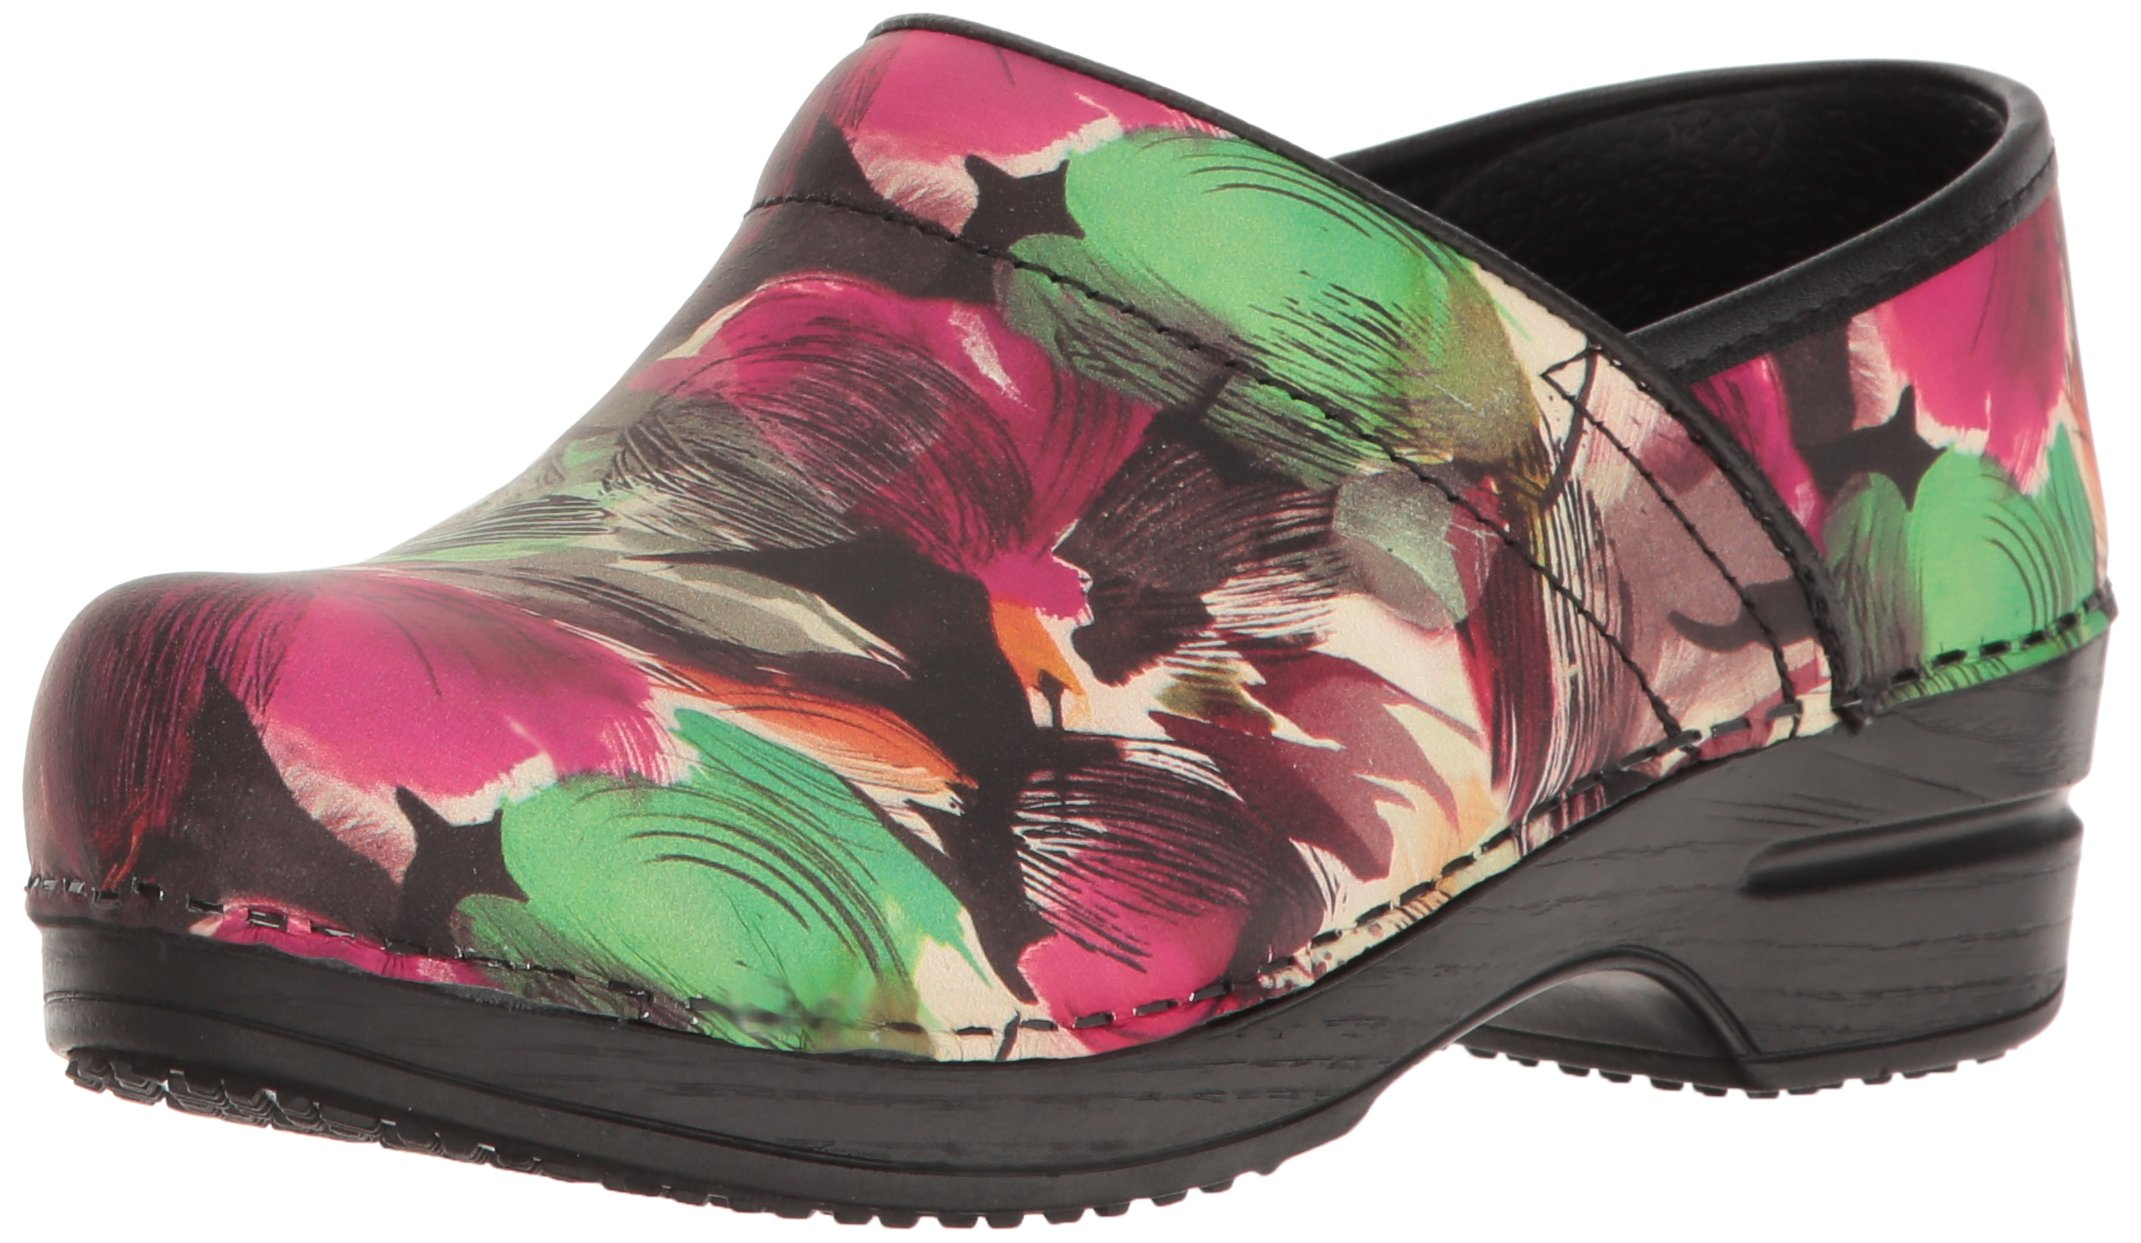 Sanita Women's Smart Step Sharon Work Shoe, Multicolor, 35 EU/5 M US